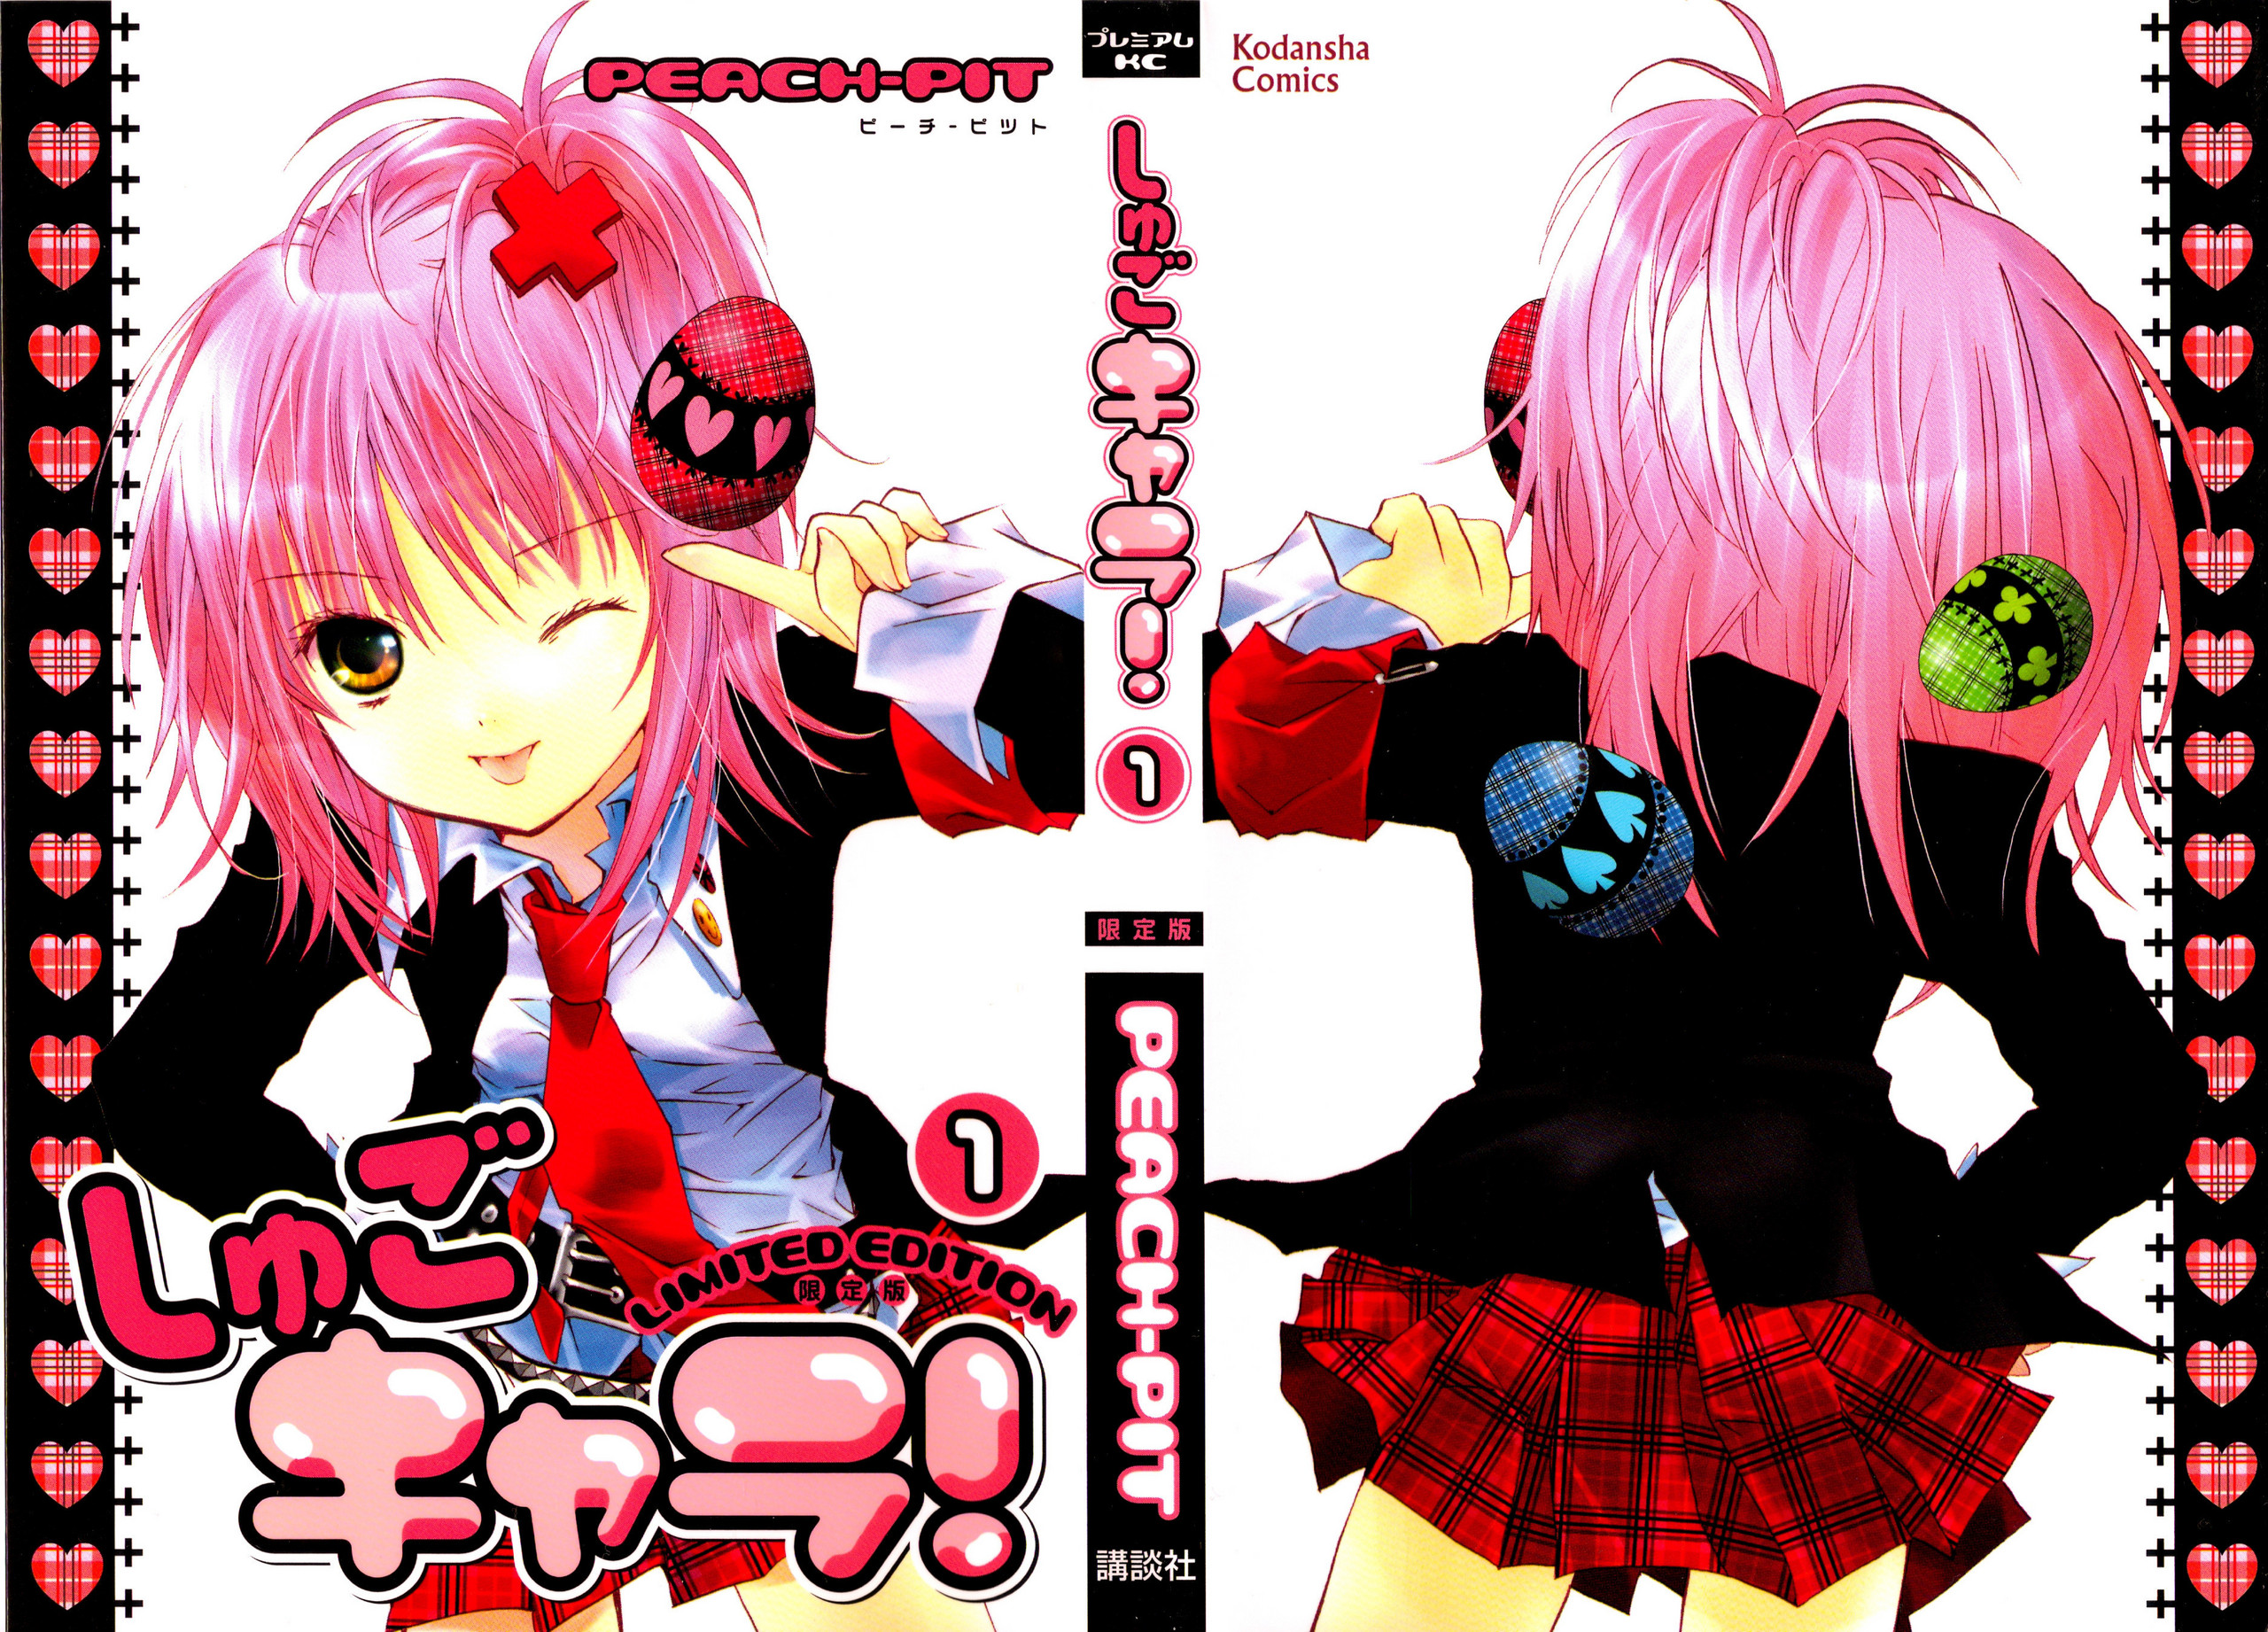 DVD Covers - Shugo Chara Photo (25062715) - Fanpop